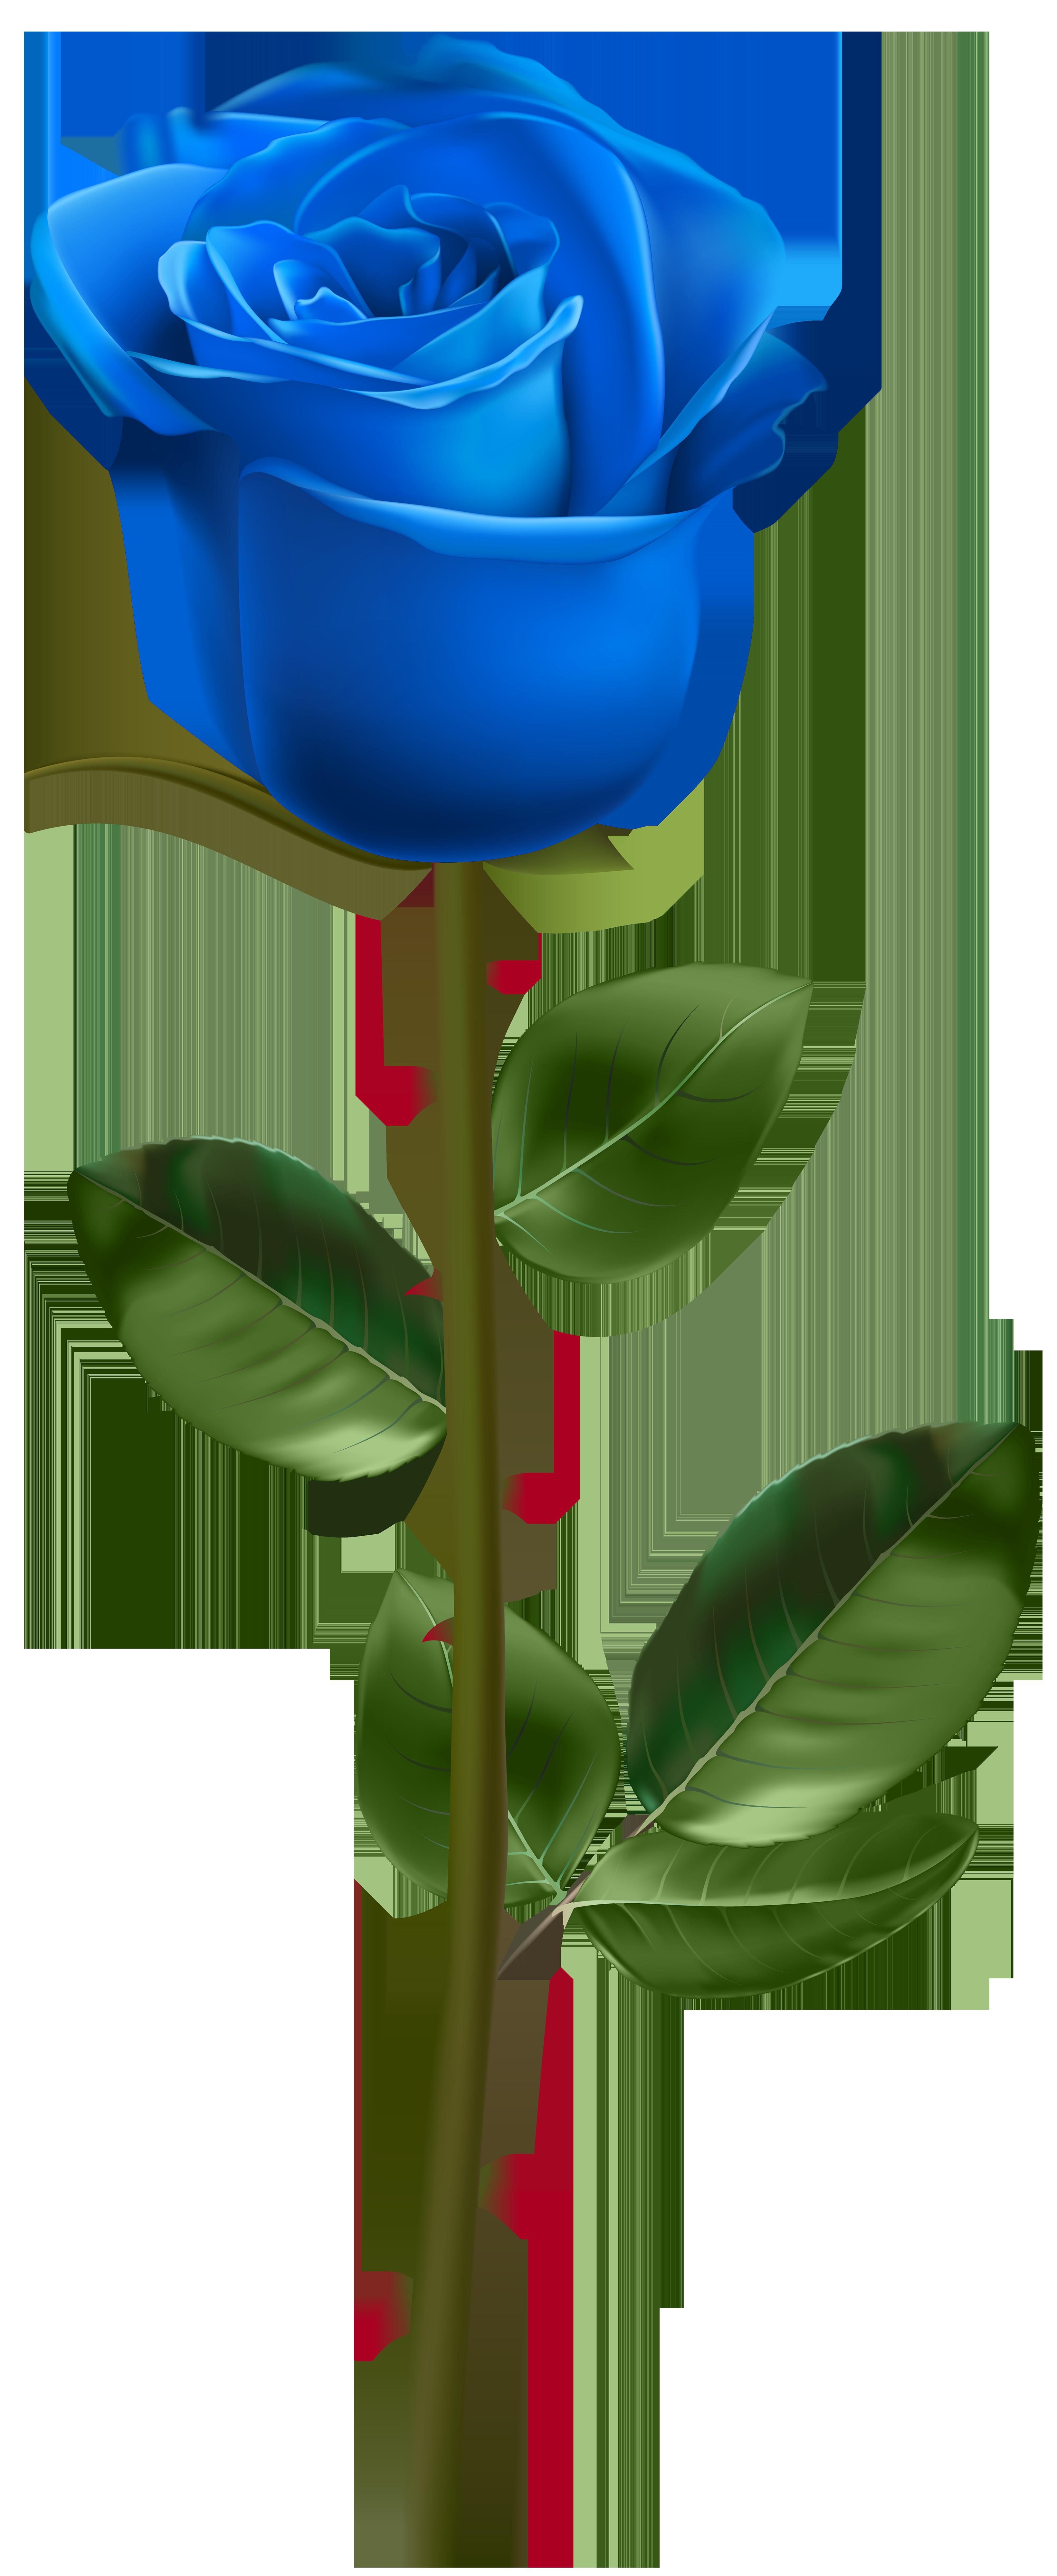 Grains clipart wheat stem. Blue rose with transparent